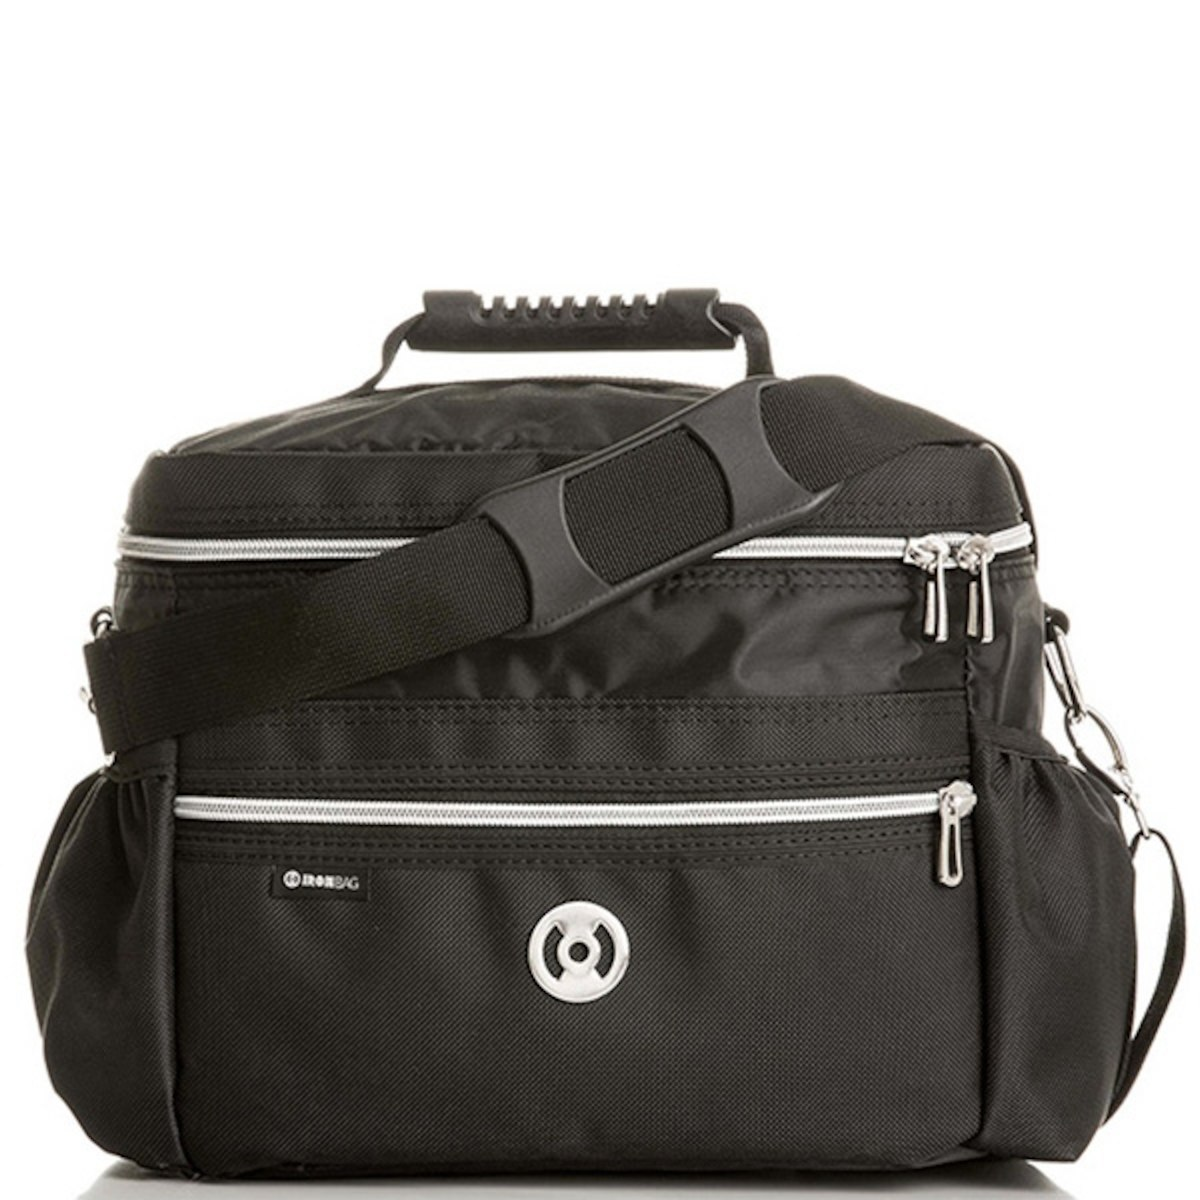 a06a62aef Bolsa Térmica Iron Bag Clássica Pop Preta - Bolsa Térmica Fitness